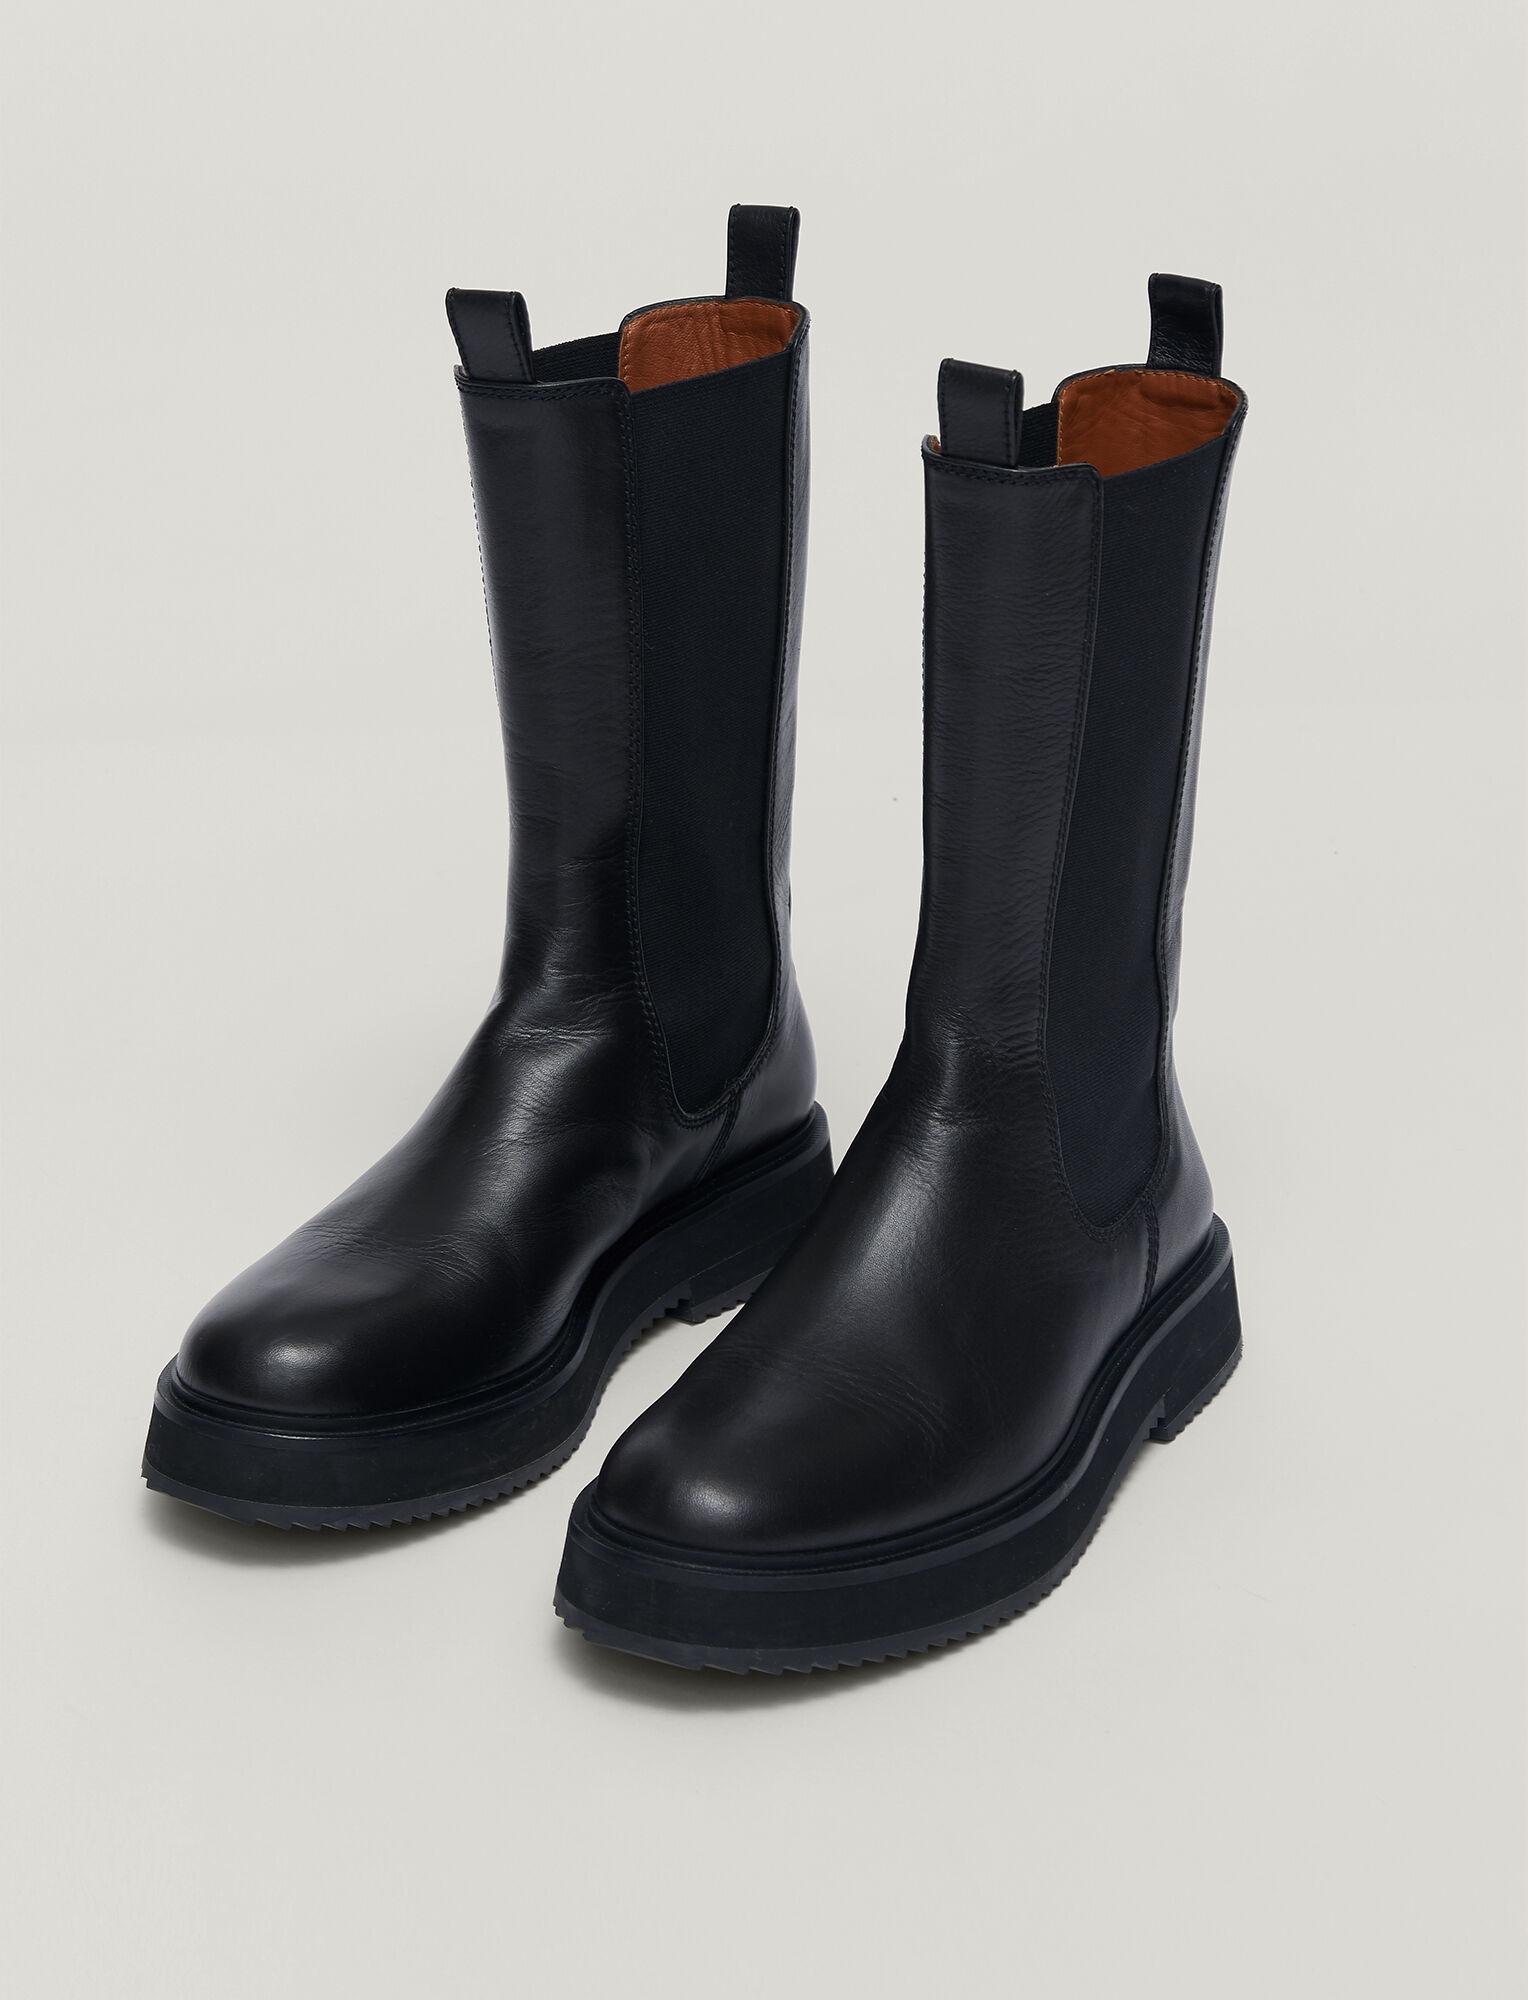 Joseph, Leather British Chelsea Boots, in BLACK